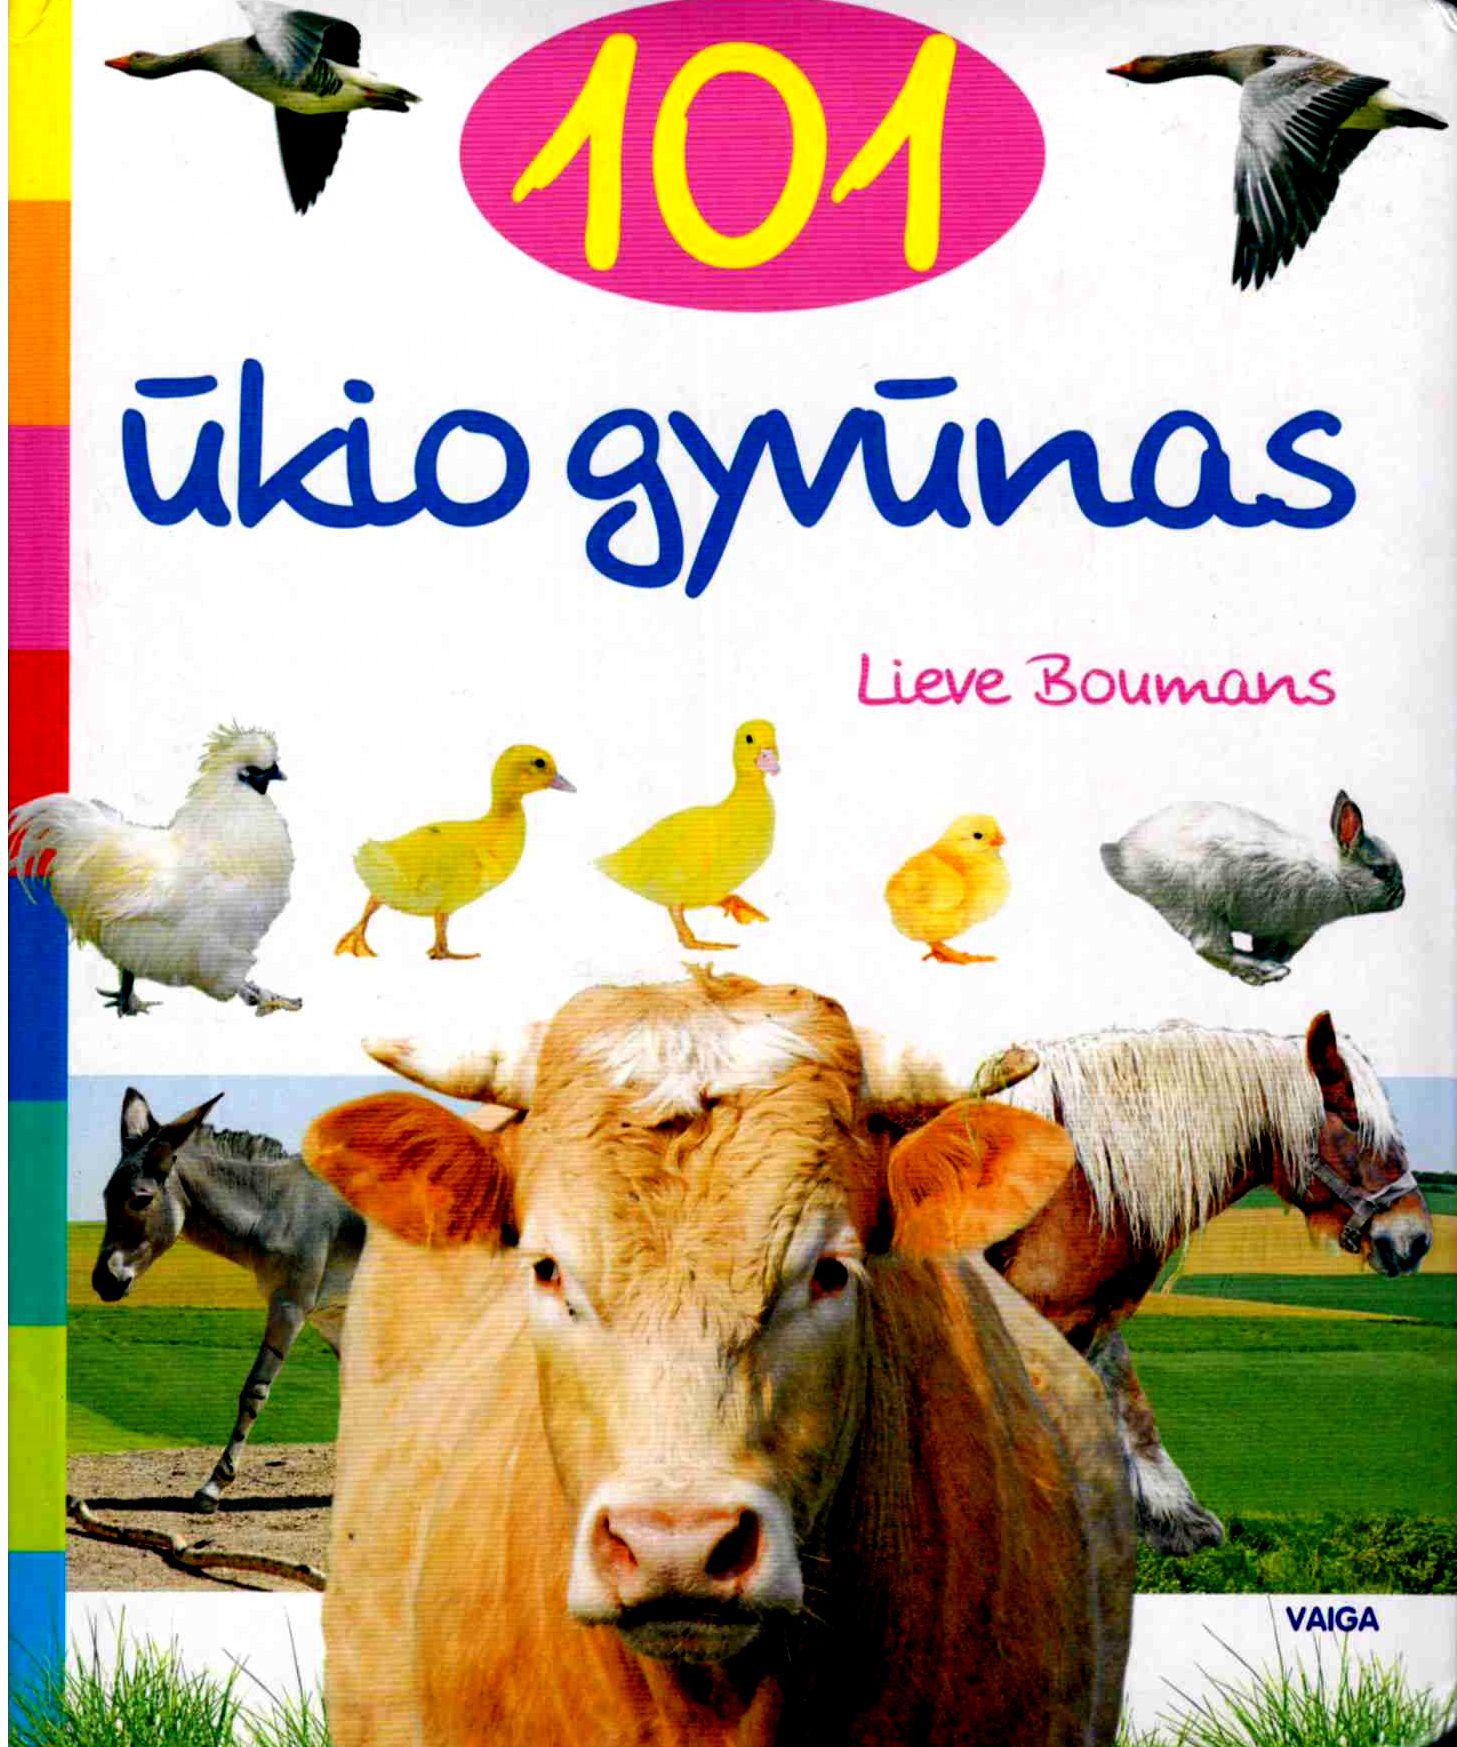 101 ūkio gyvūnas